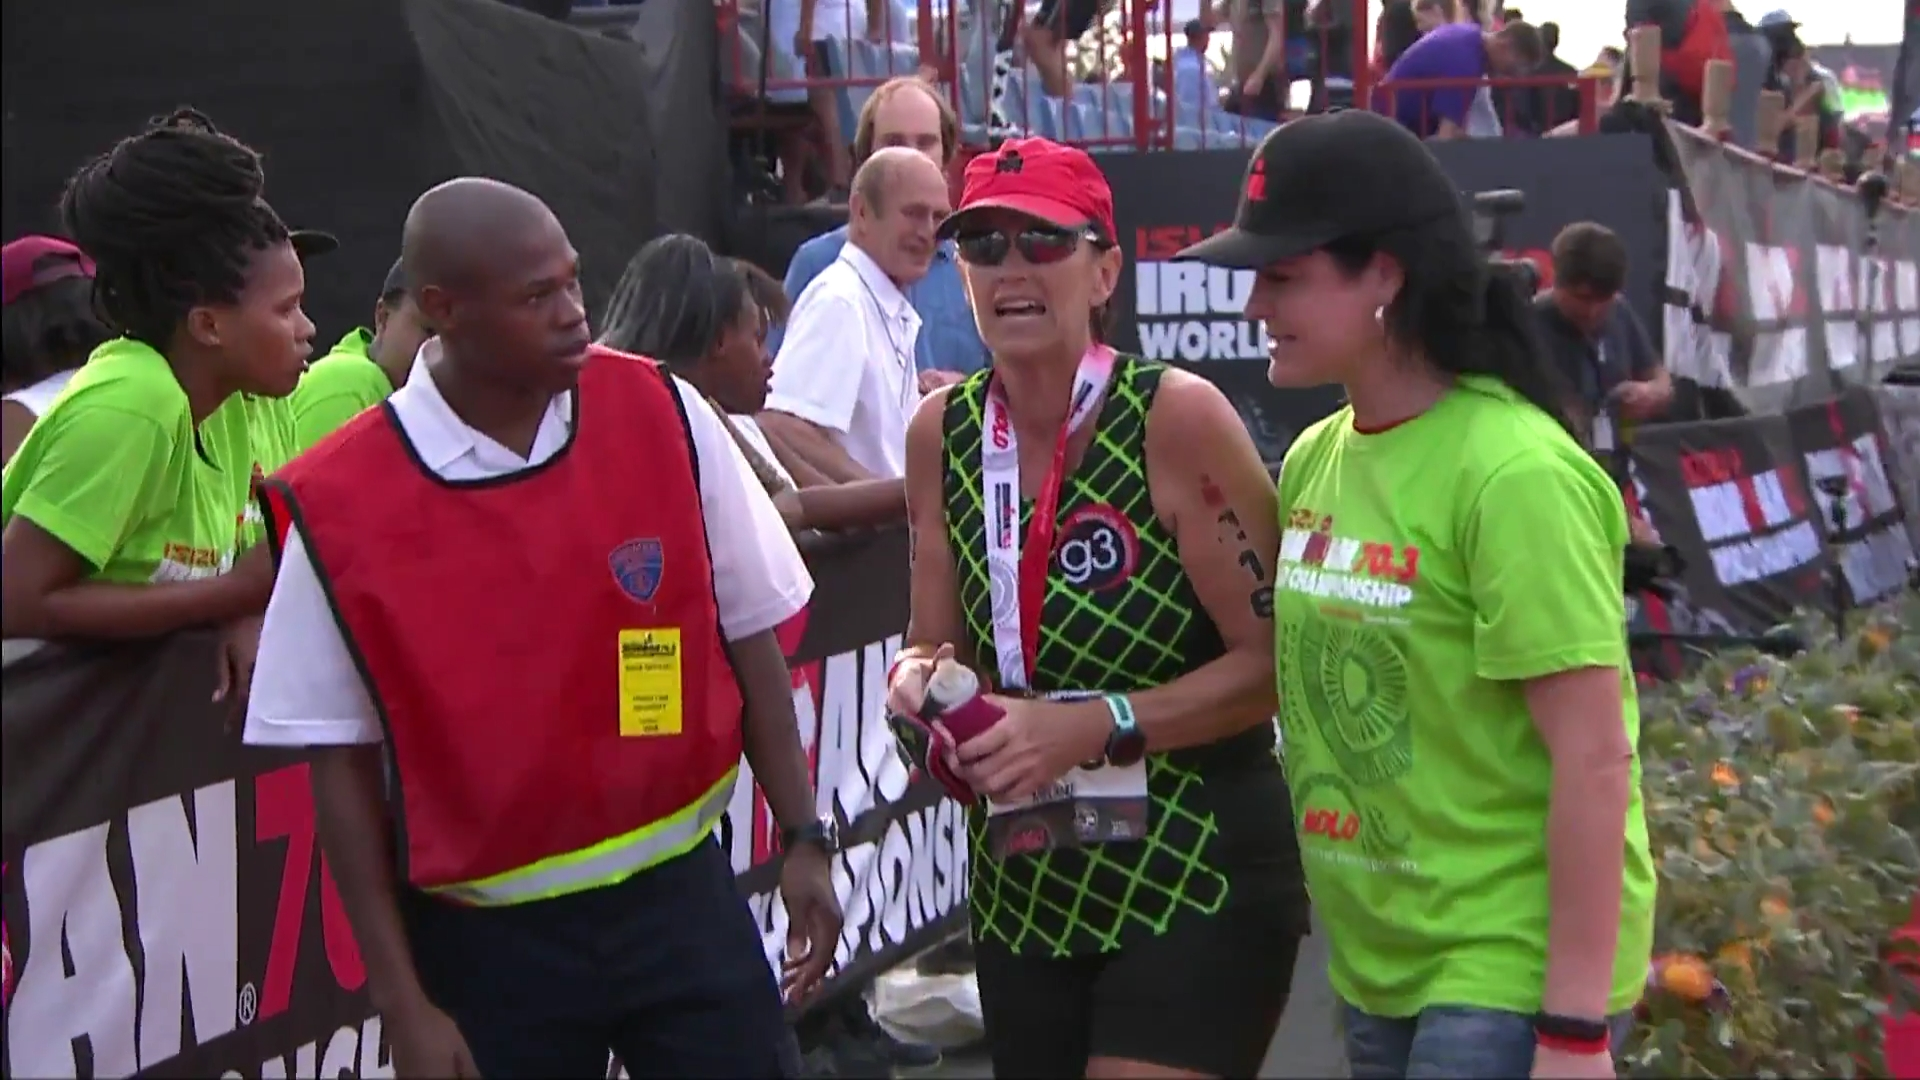 Melanie Cameron – Ironman World Championship 2018 20